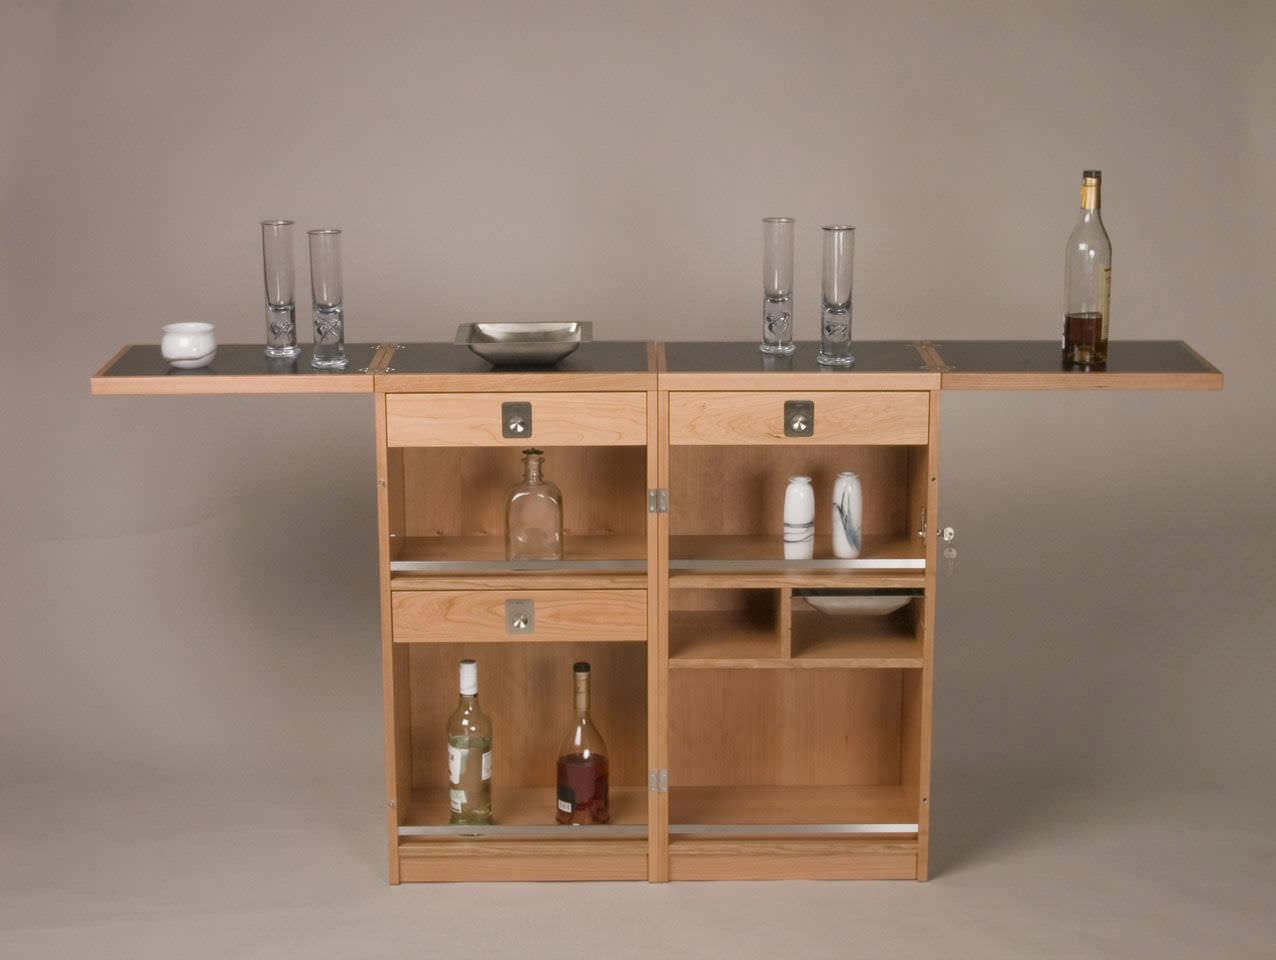 Tu bar en casa for Mueble bar madera